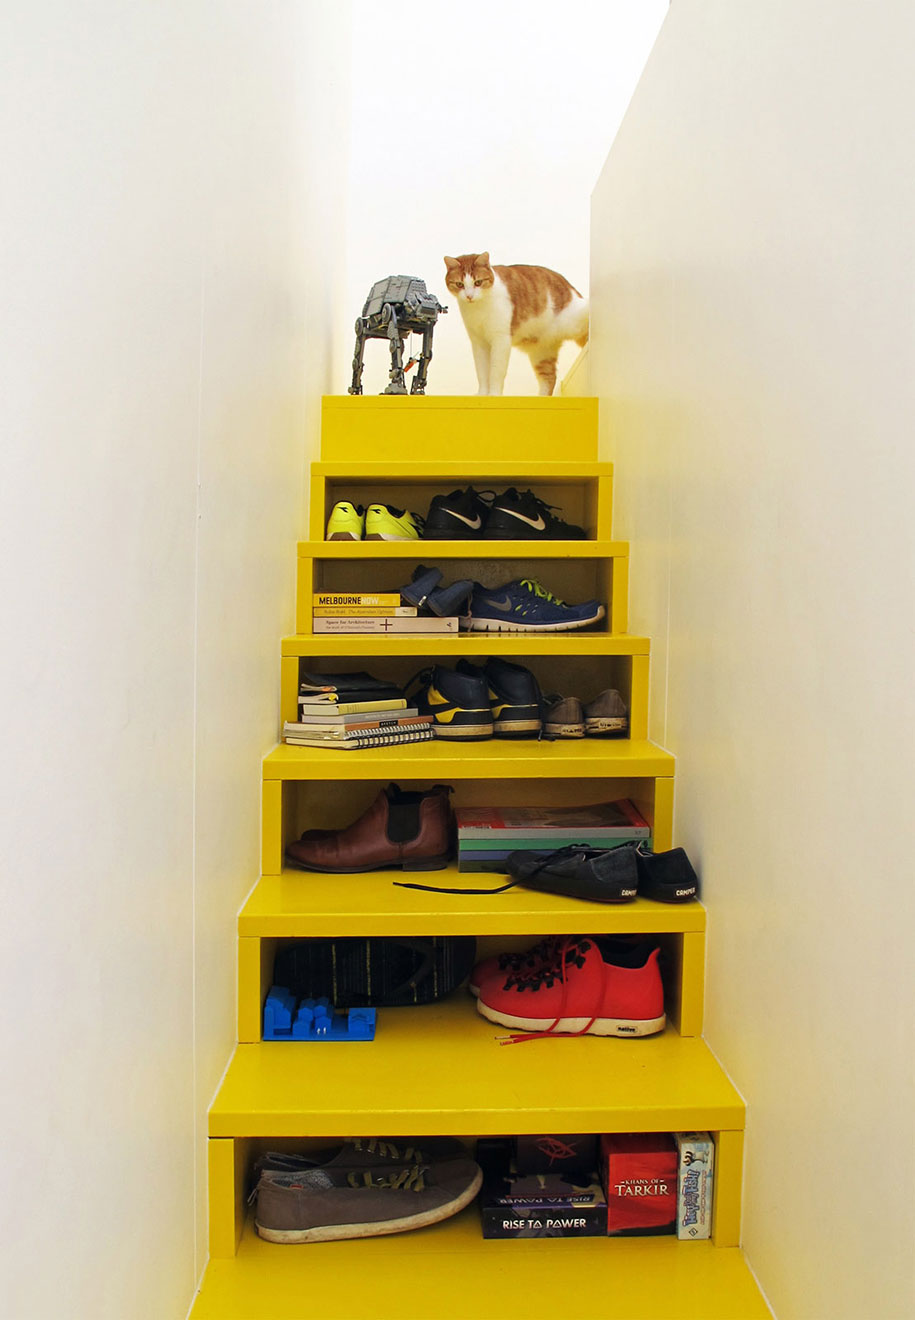 Mental Health House staircase